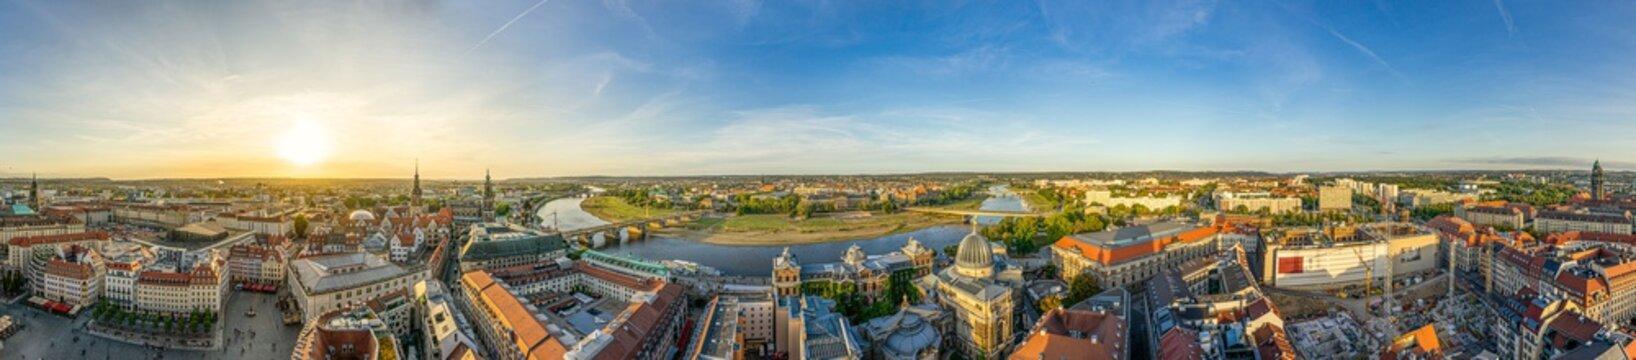 Panorama über Dresden